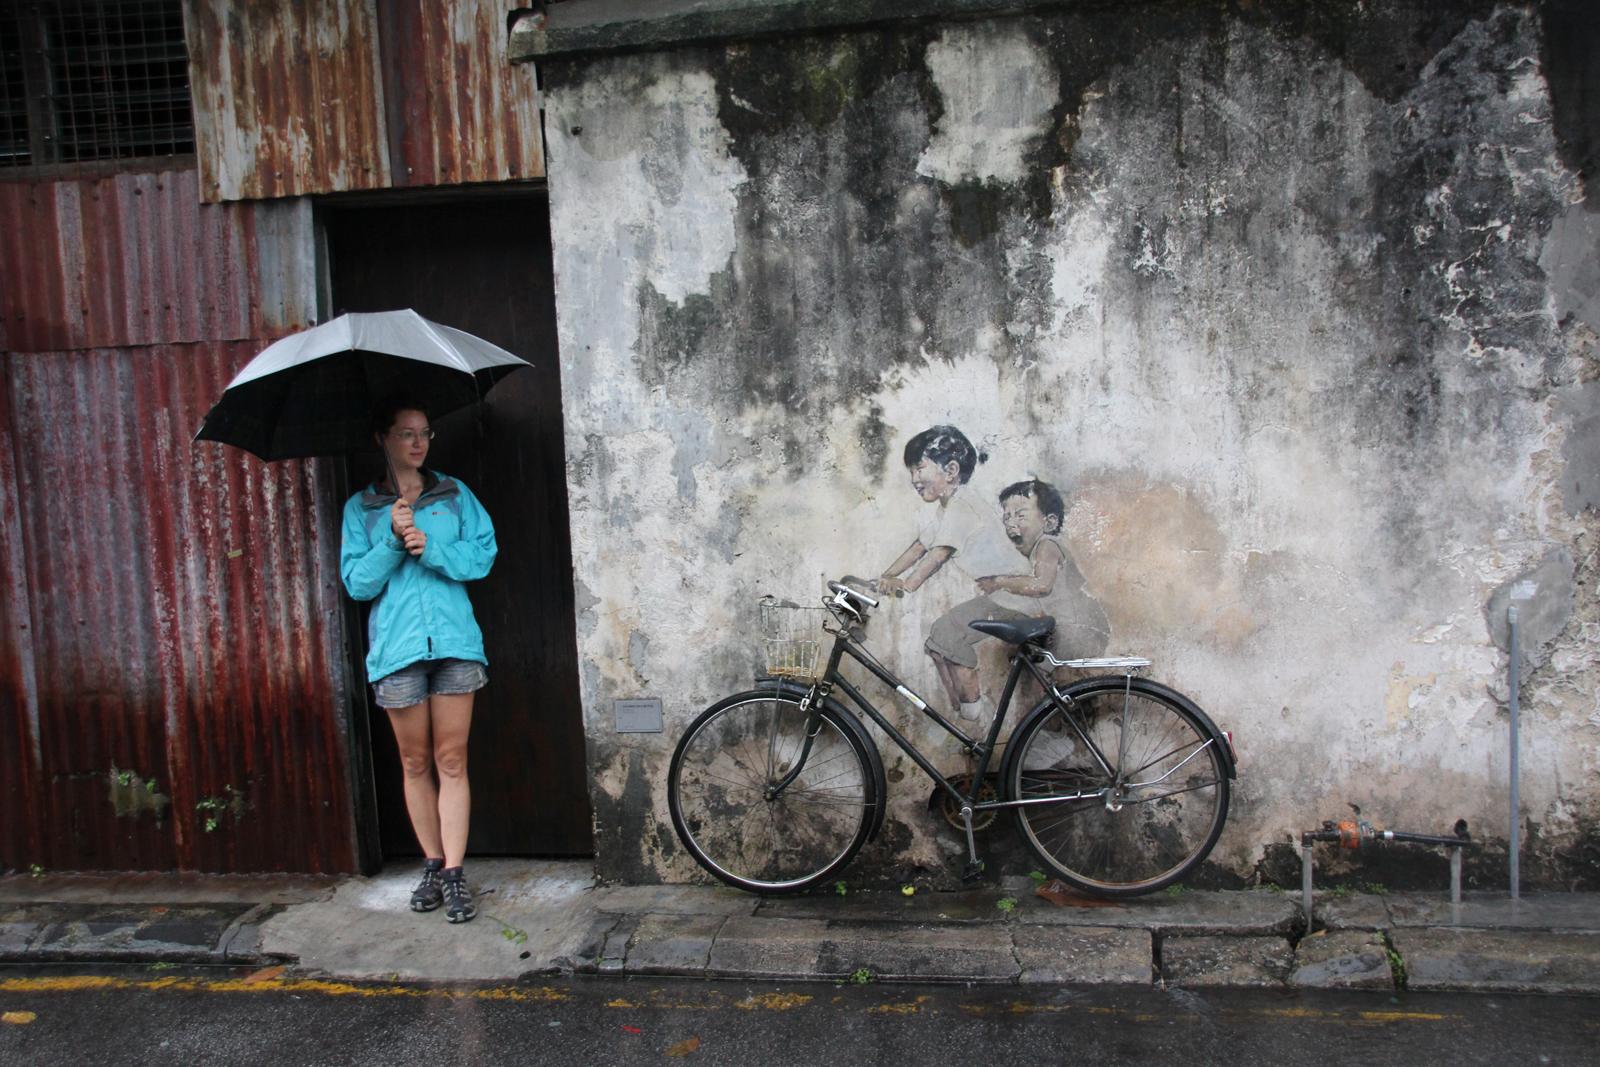 bicylce-street-art-penang-buy-no-rhino